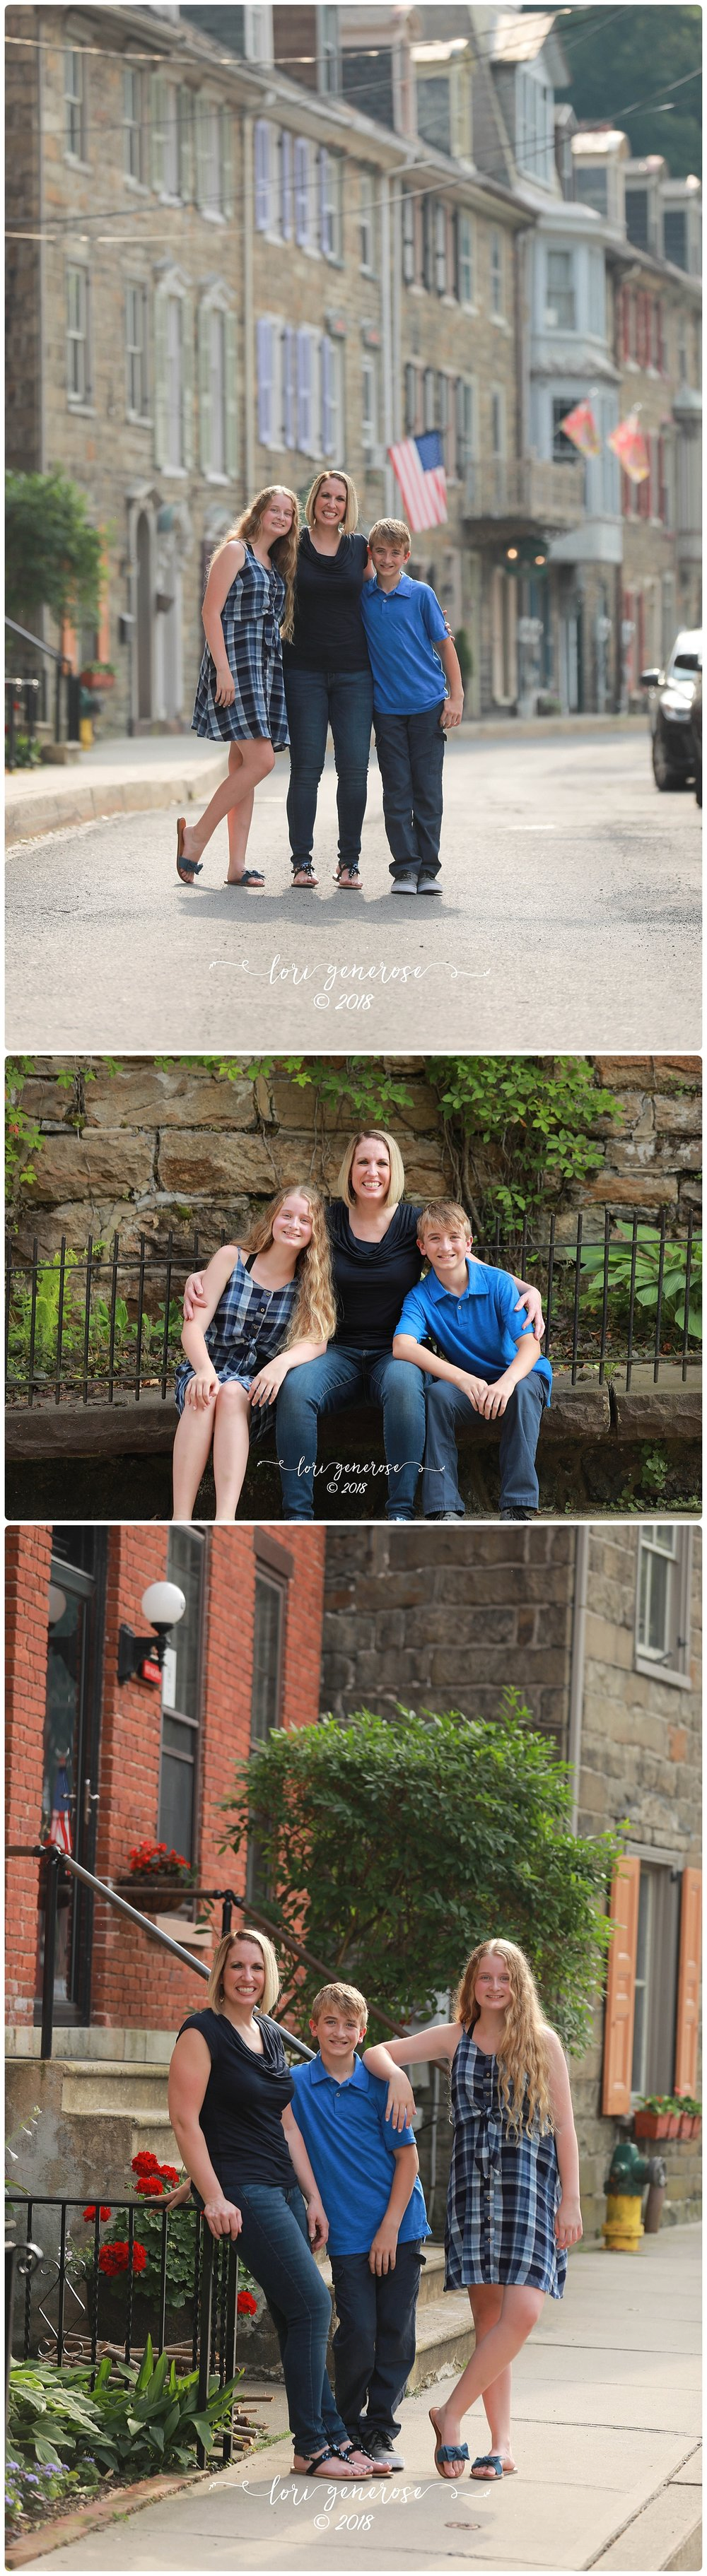 lgphotographylorigeneroseoutdooronlocationfamilysessionjimthorpepamomandherkids.jpg